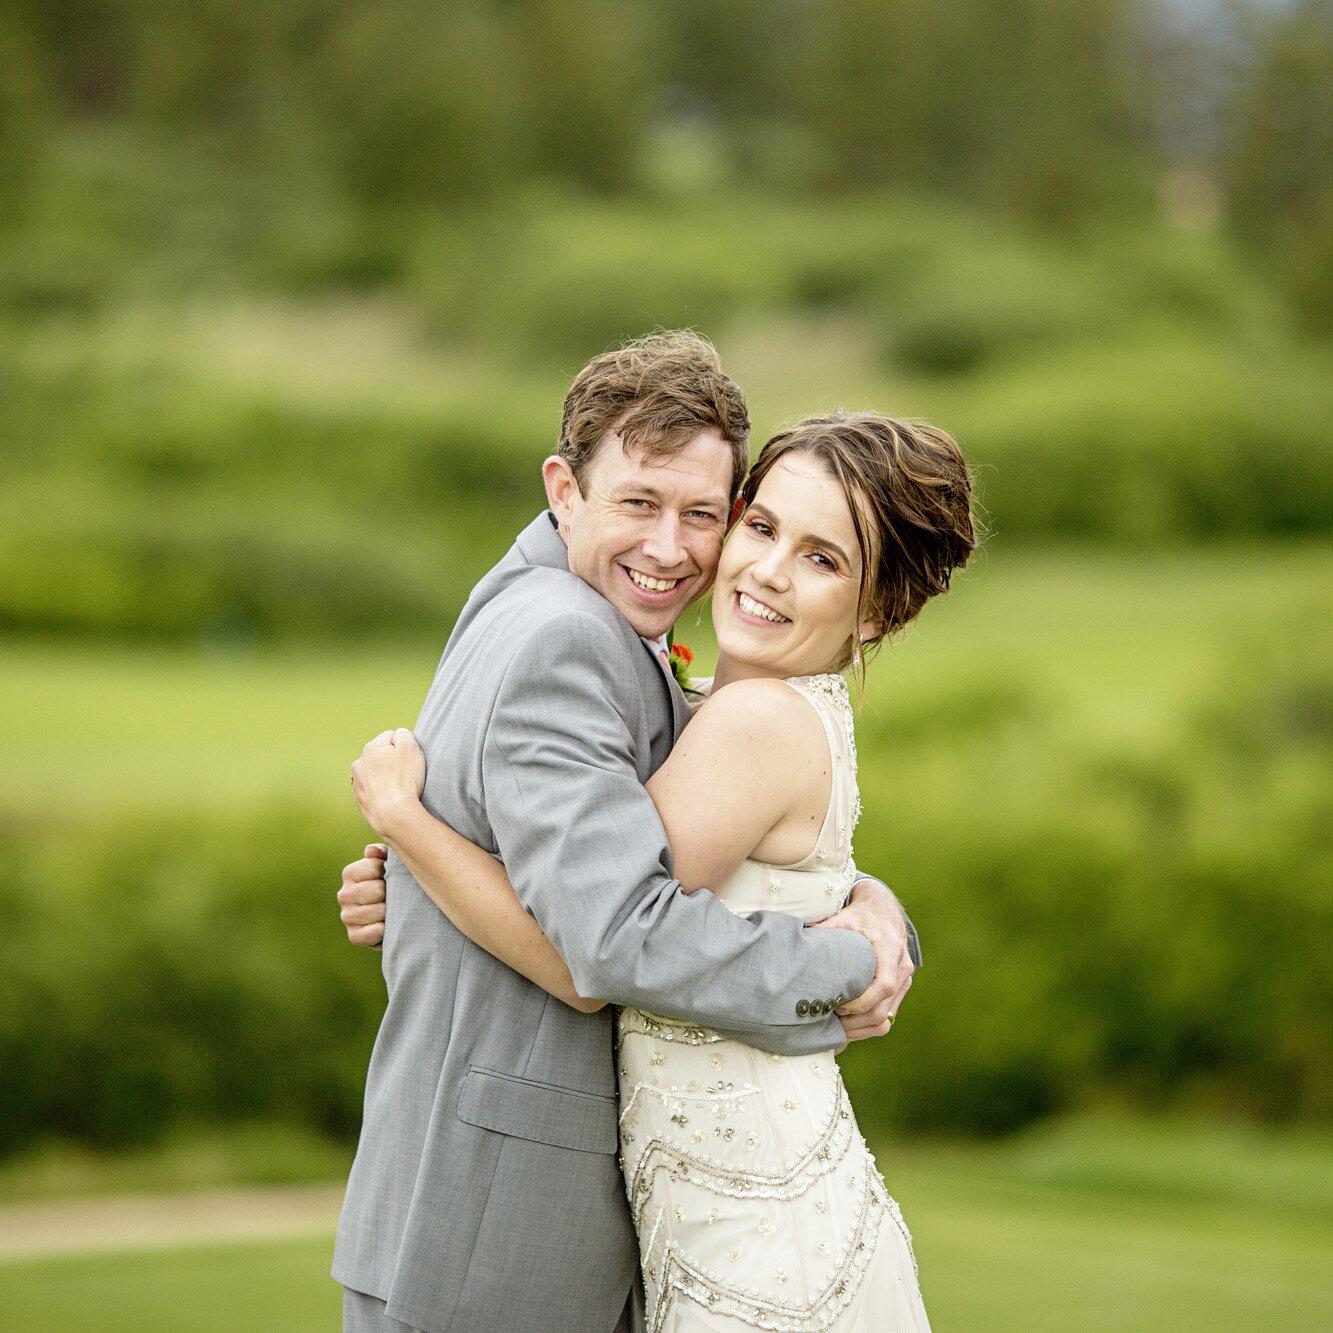 Seriously_Sabrina_Photography_Colorado_Springs_Club_at_Flying_Horse_Destination_Wedding_ODwyer83.jpg